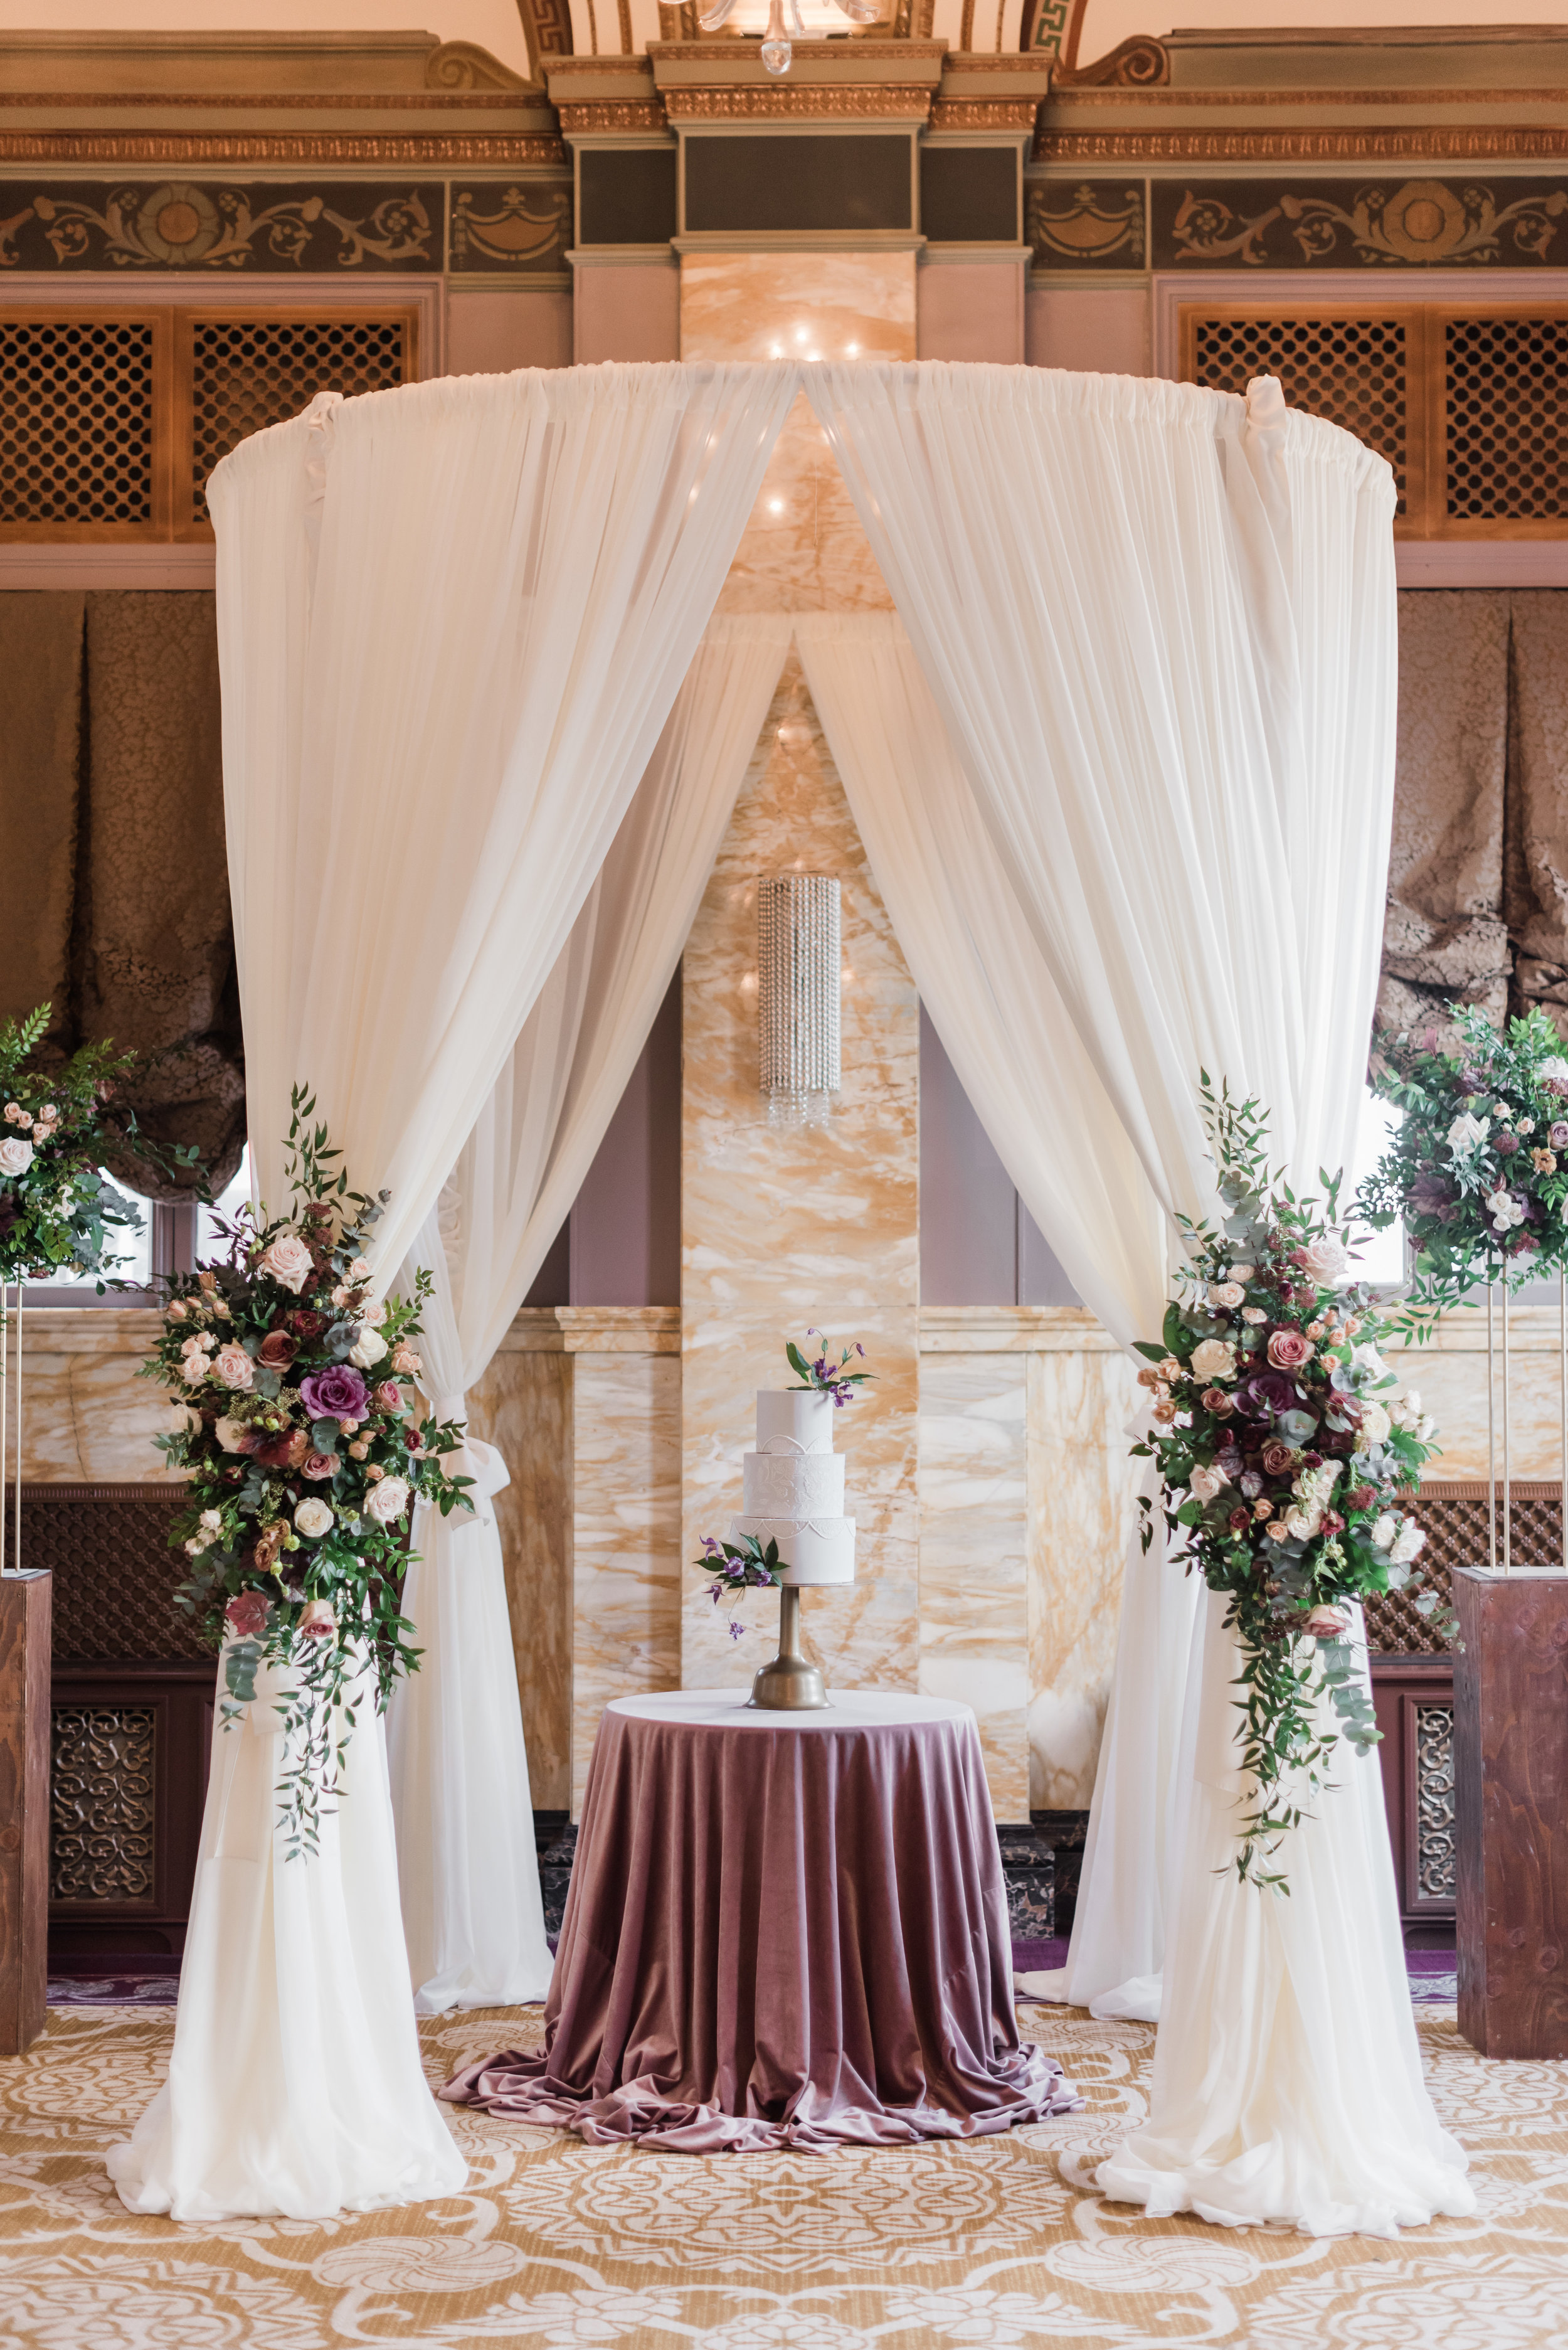 Wedding cake backdrop at Sentinel Hotel.